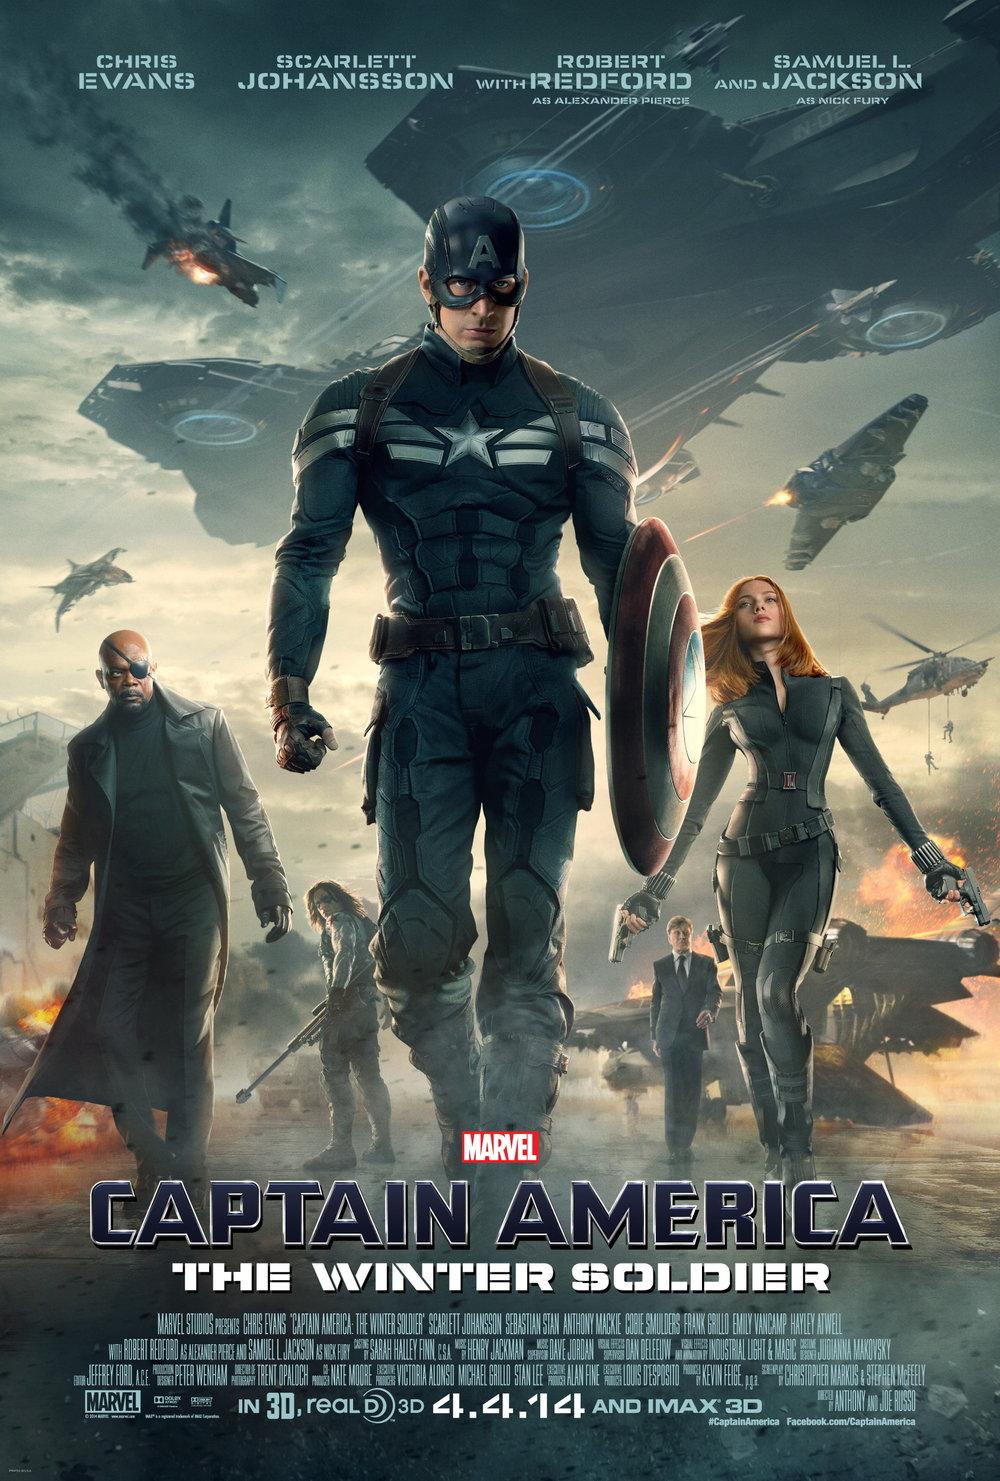 captain-america-the-winter-soldier-movie-poster-marvel-cinematic-1038896.jpg